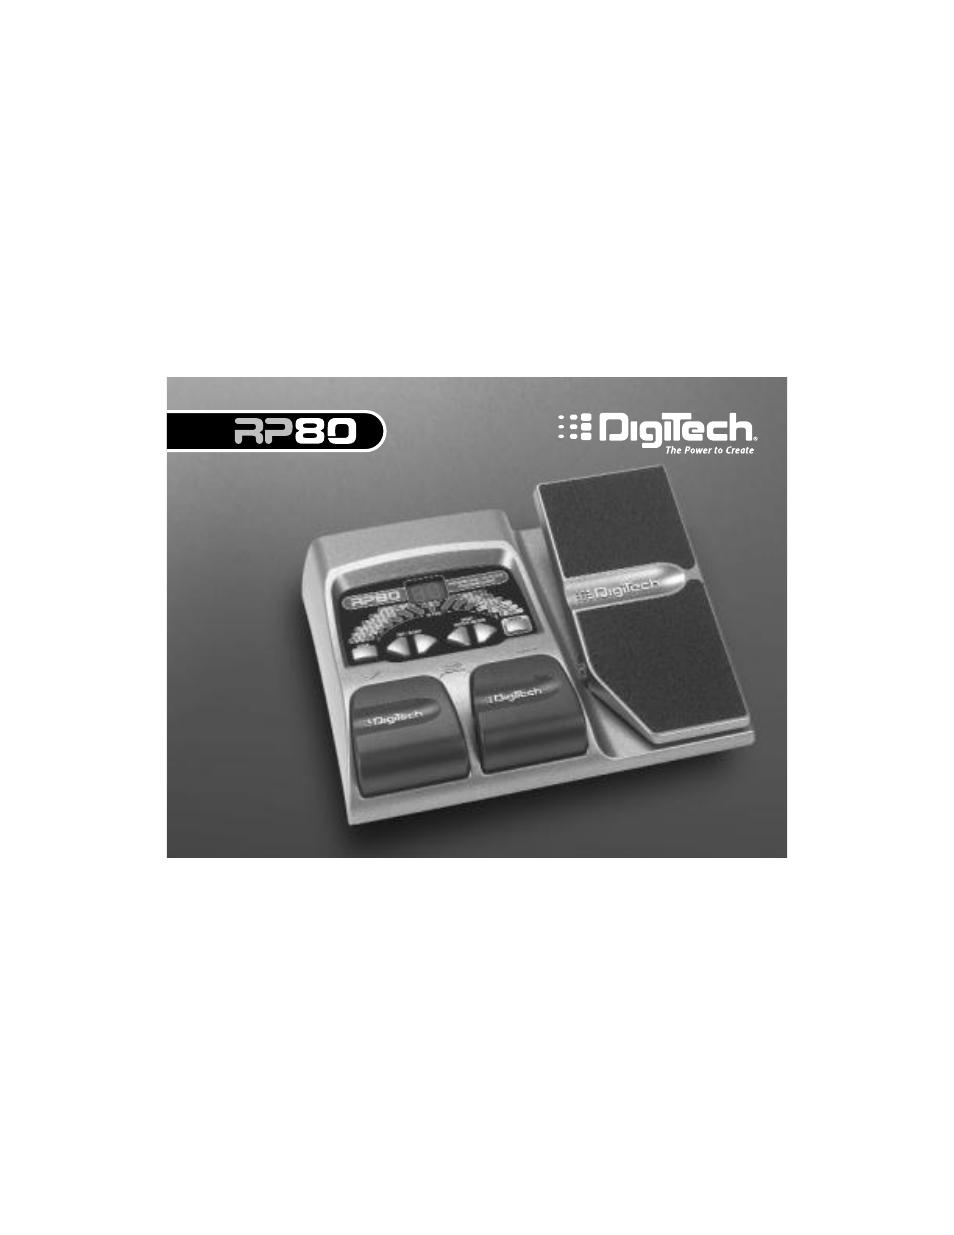 digitech rp80 user manual 32 pages rh manualsdir com Rp 10 Digitech Power Supply Digitech RP90